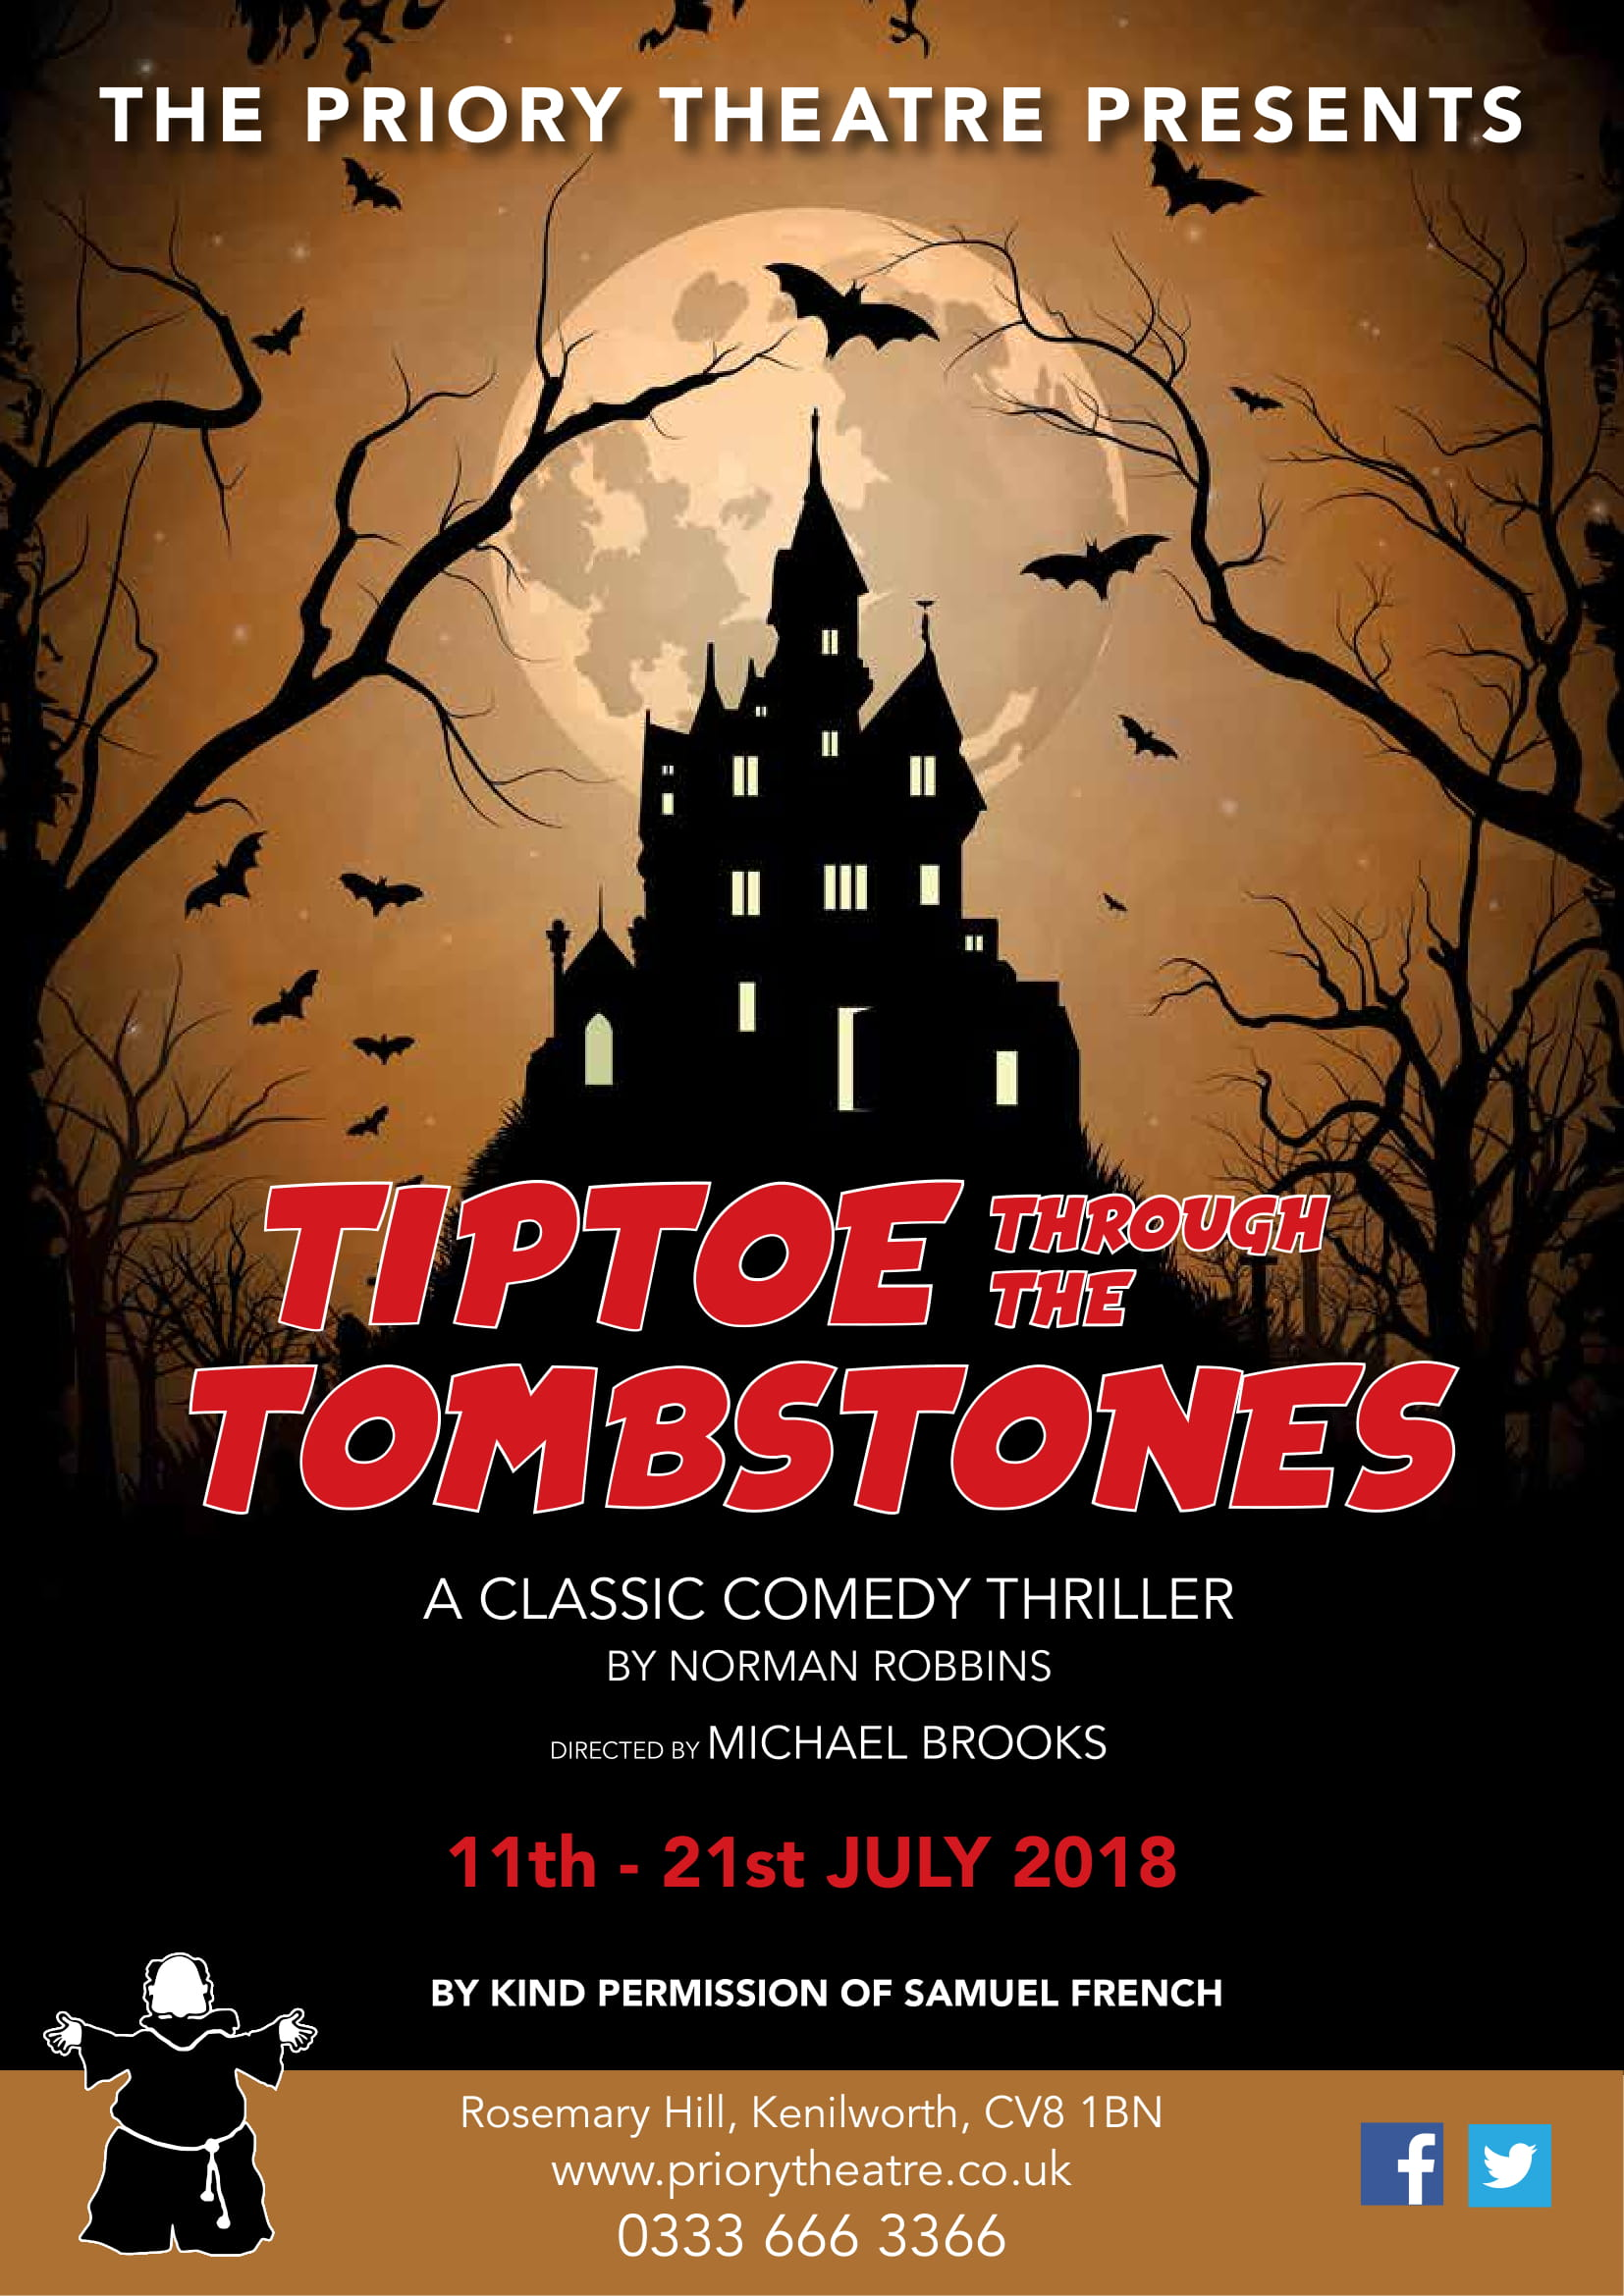 Tiptoe through the Tombstones Poster-1.jpg